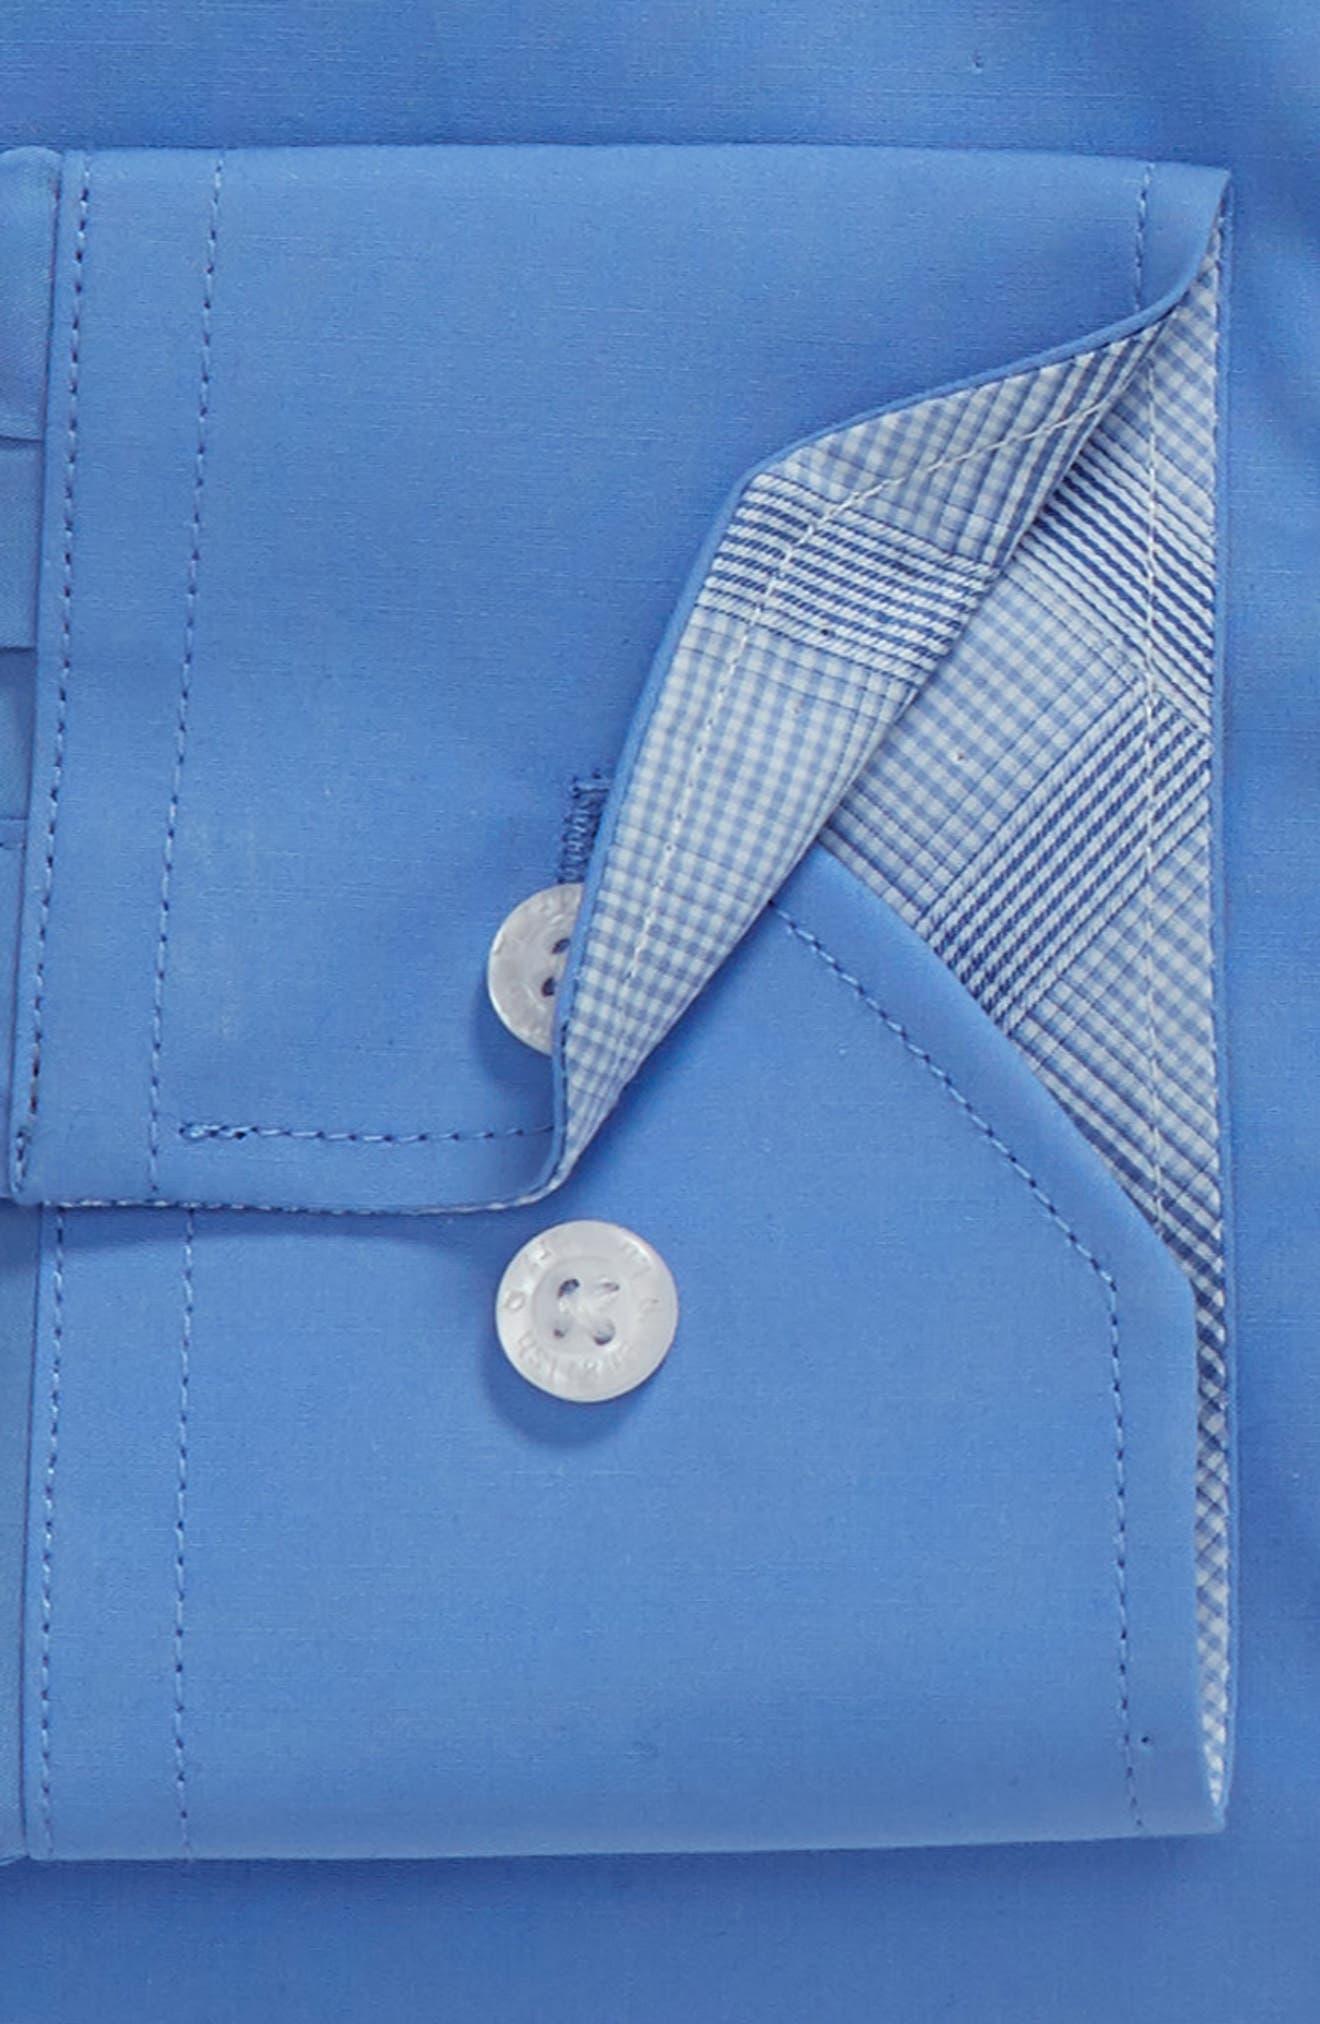 Regular Fit Stretch Solid Dress Shirt,                             Alternate thumbnail 6, color,                             BLUE